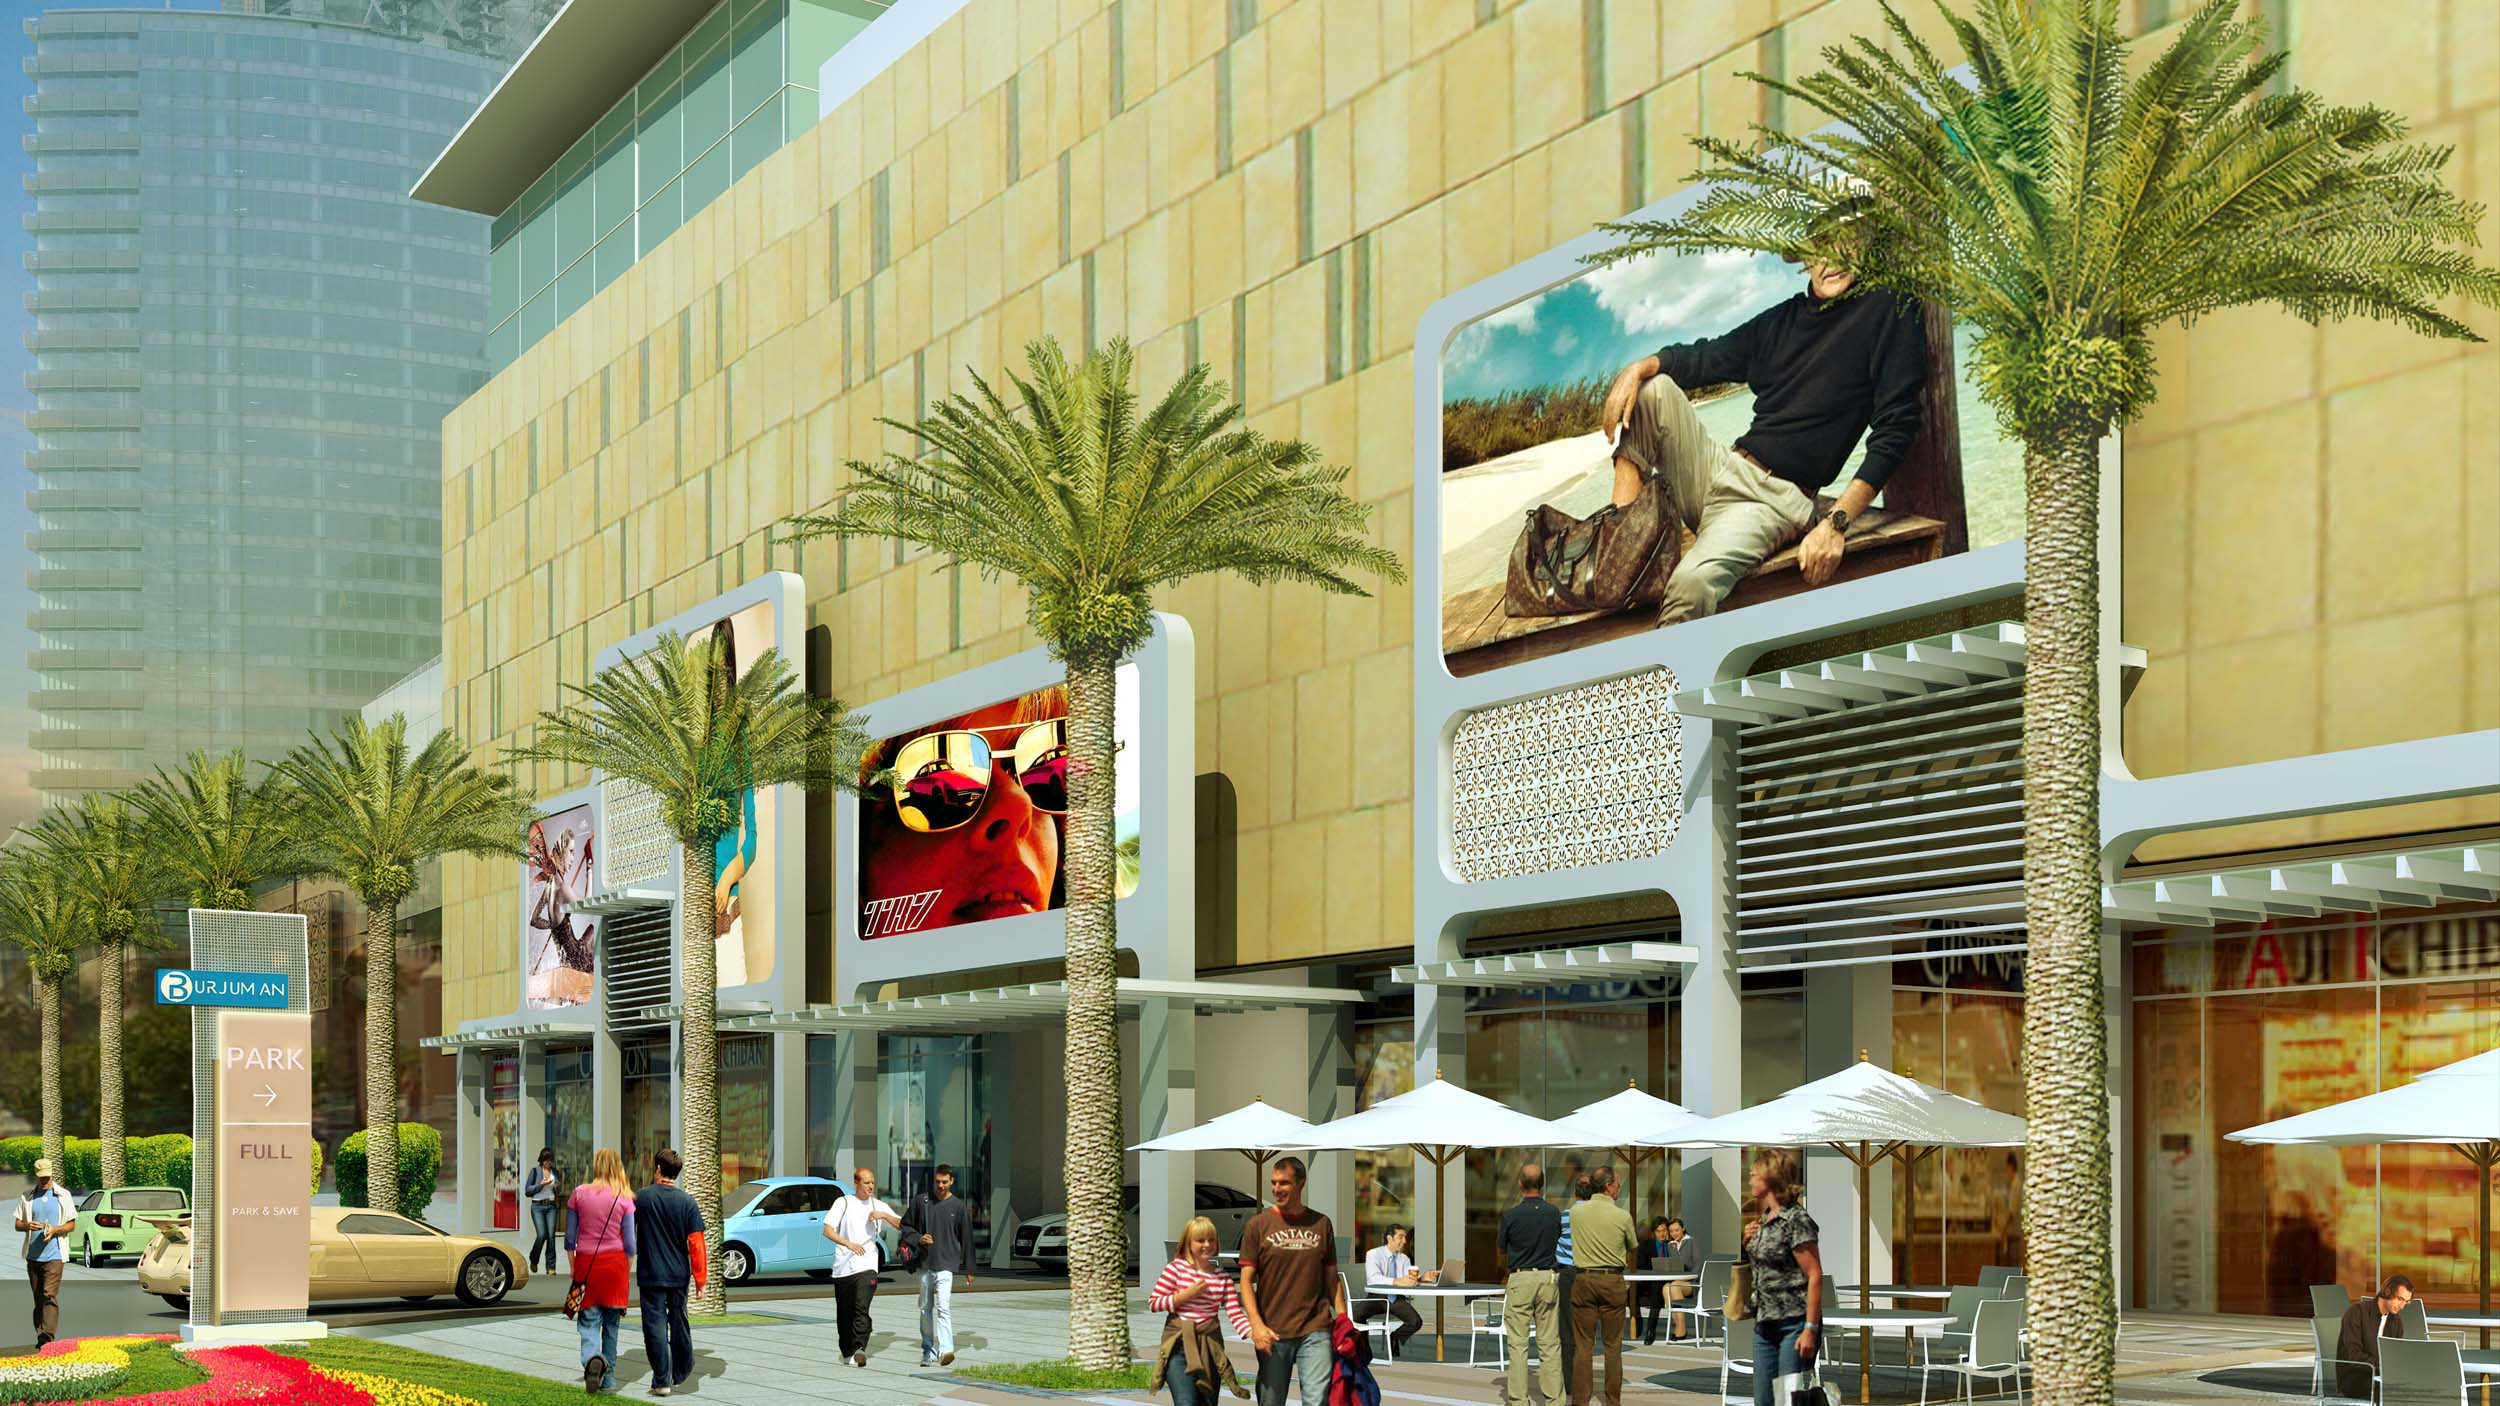 BURJUMAN MALL – Dubai, UAE